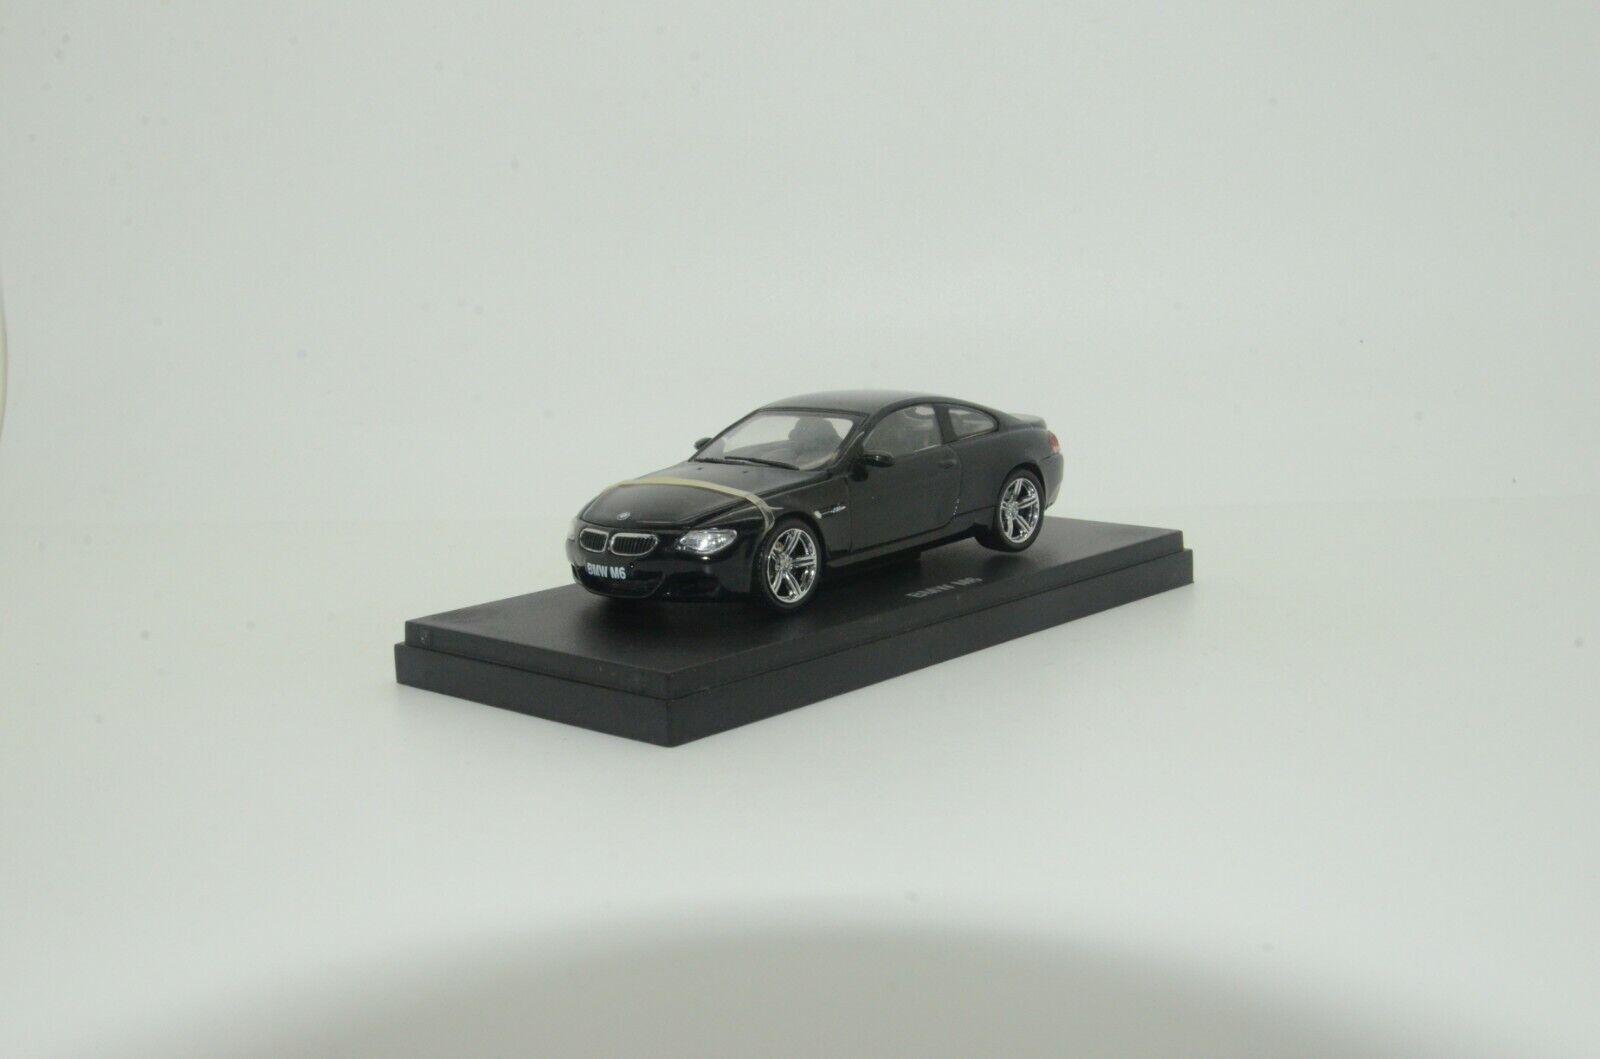 RARE  BMW M6 Coupe 2006 Kyosho 1 43